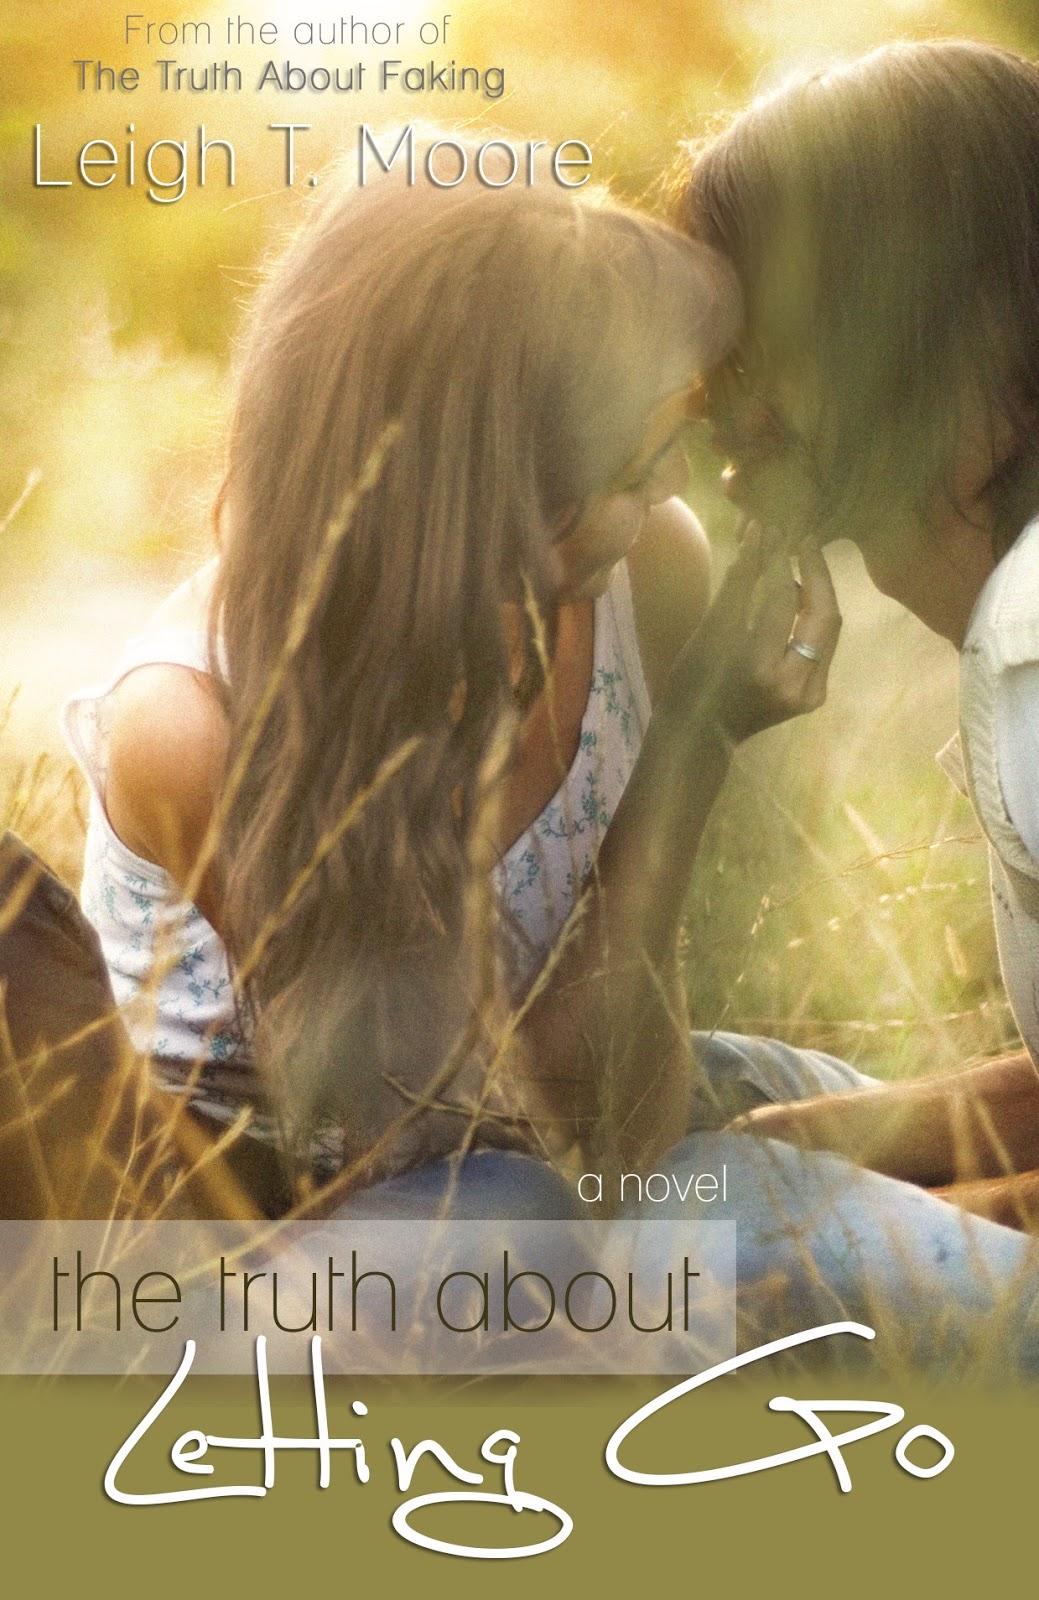 http://4.bp.blogspot.com/-qryZ_dmEcgc/USVcWRfQ7OI/AAAAAAAAOb8/codr1aTaMlc/s1600/The+Truth+About+Letting+Go+(1).jpg